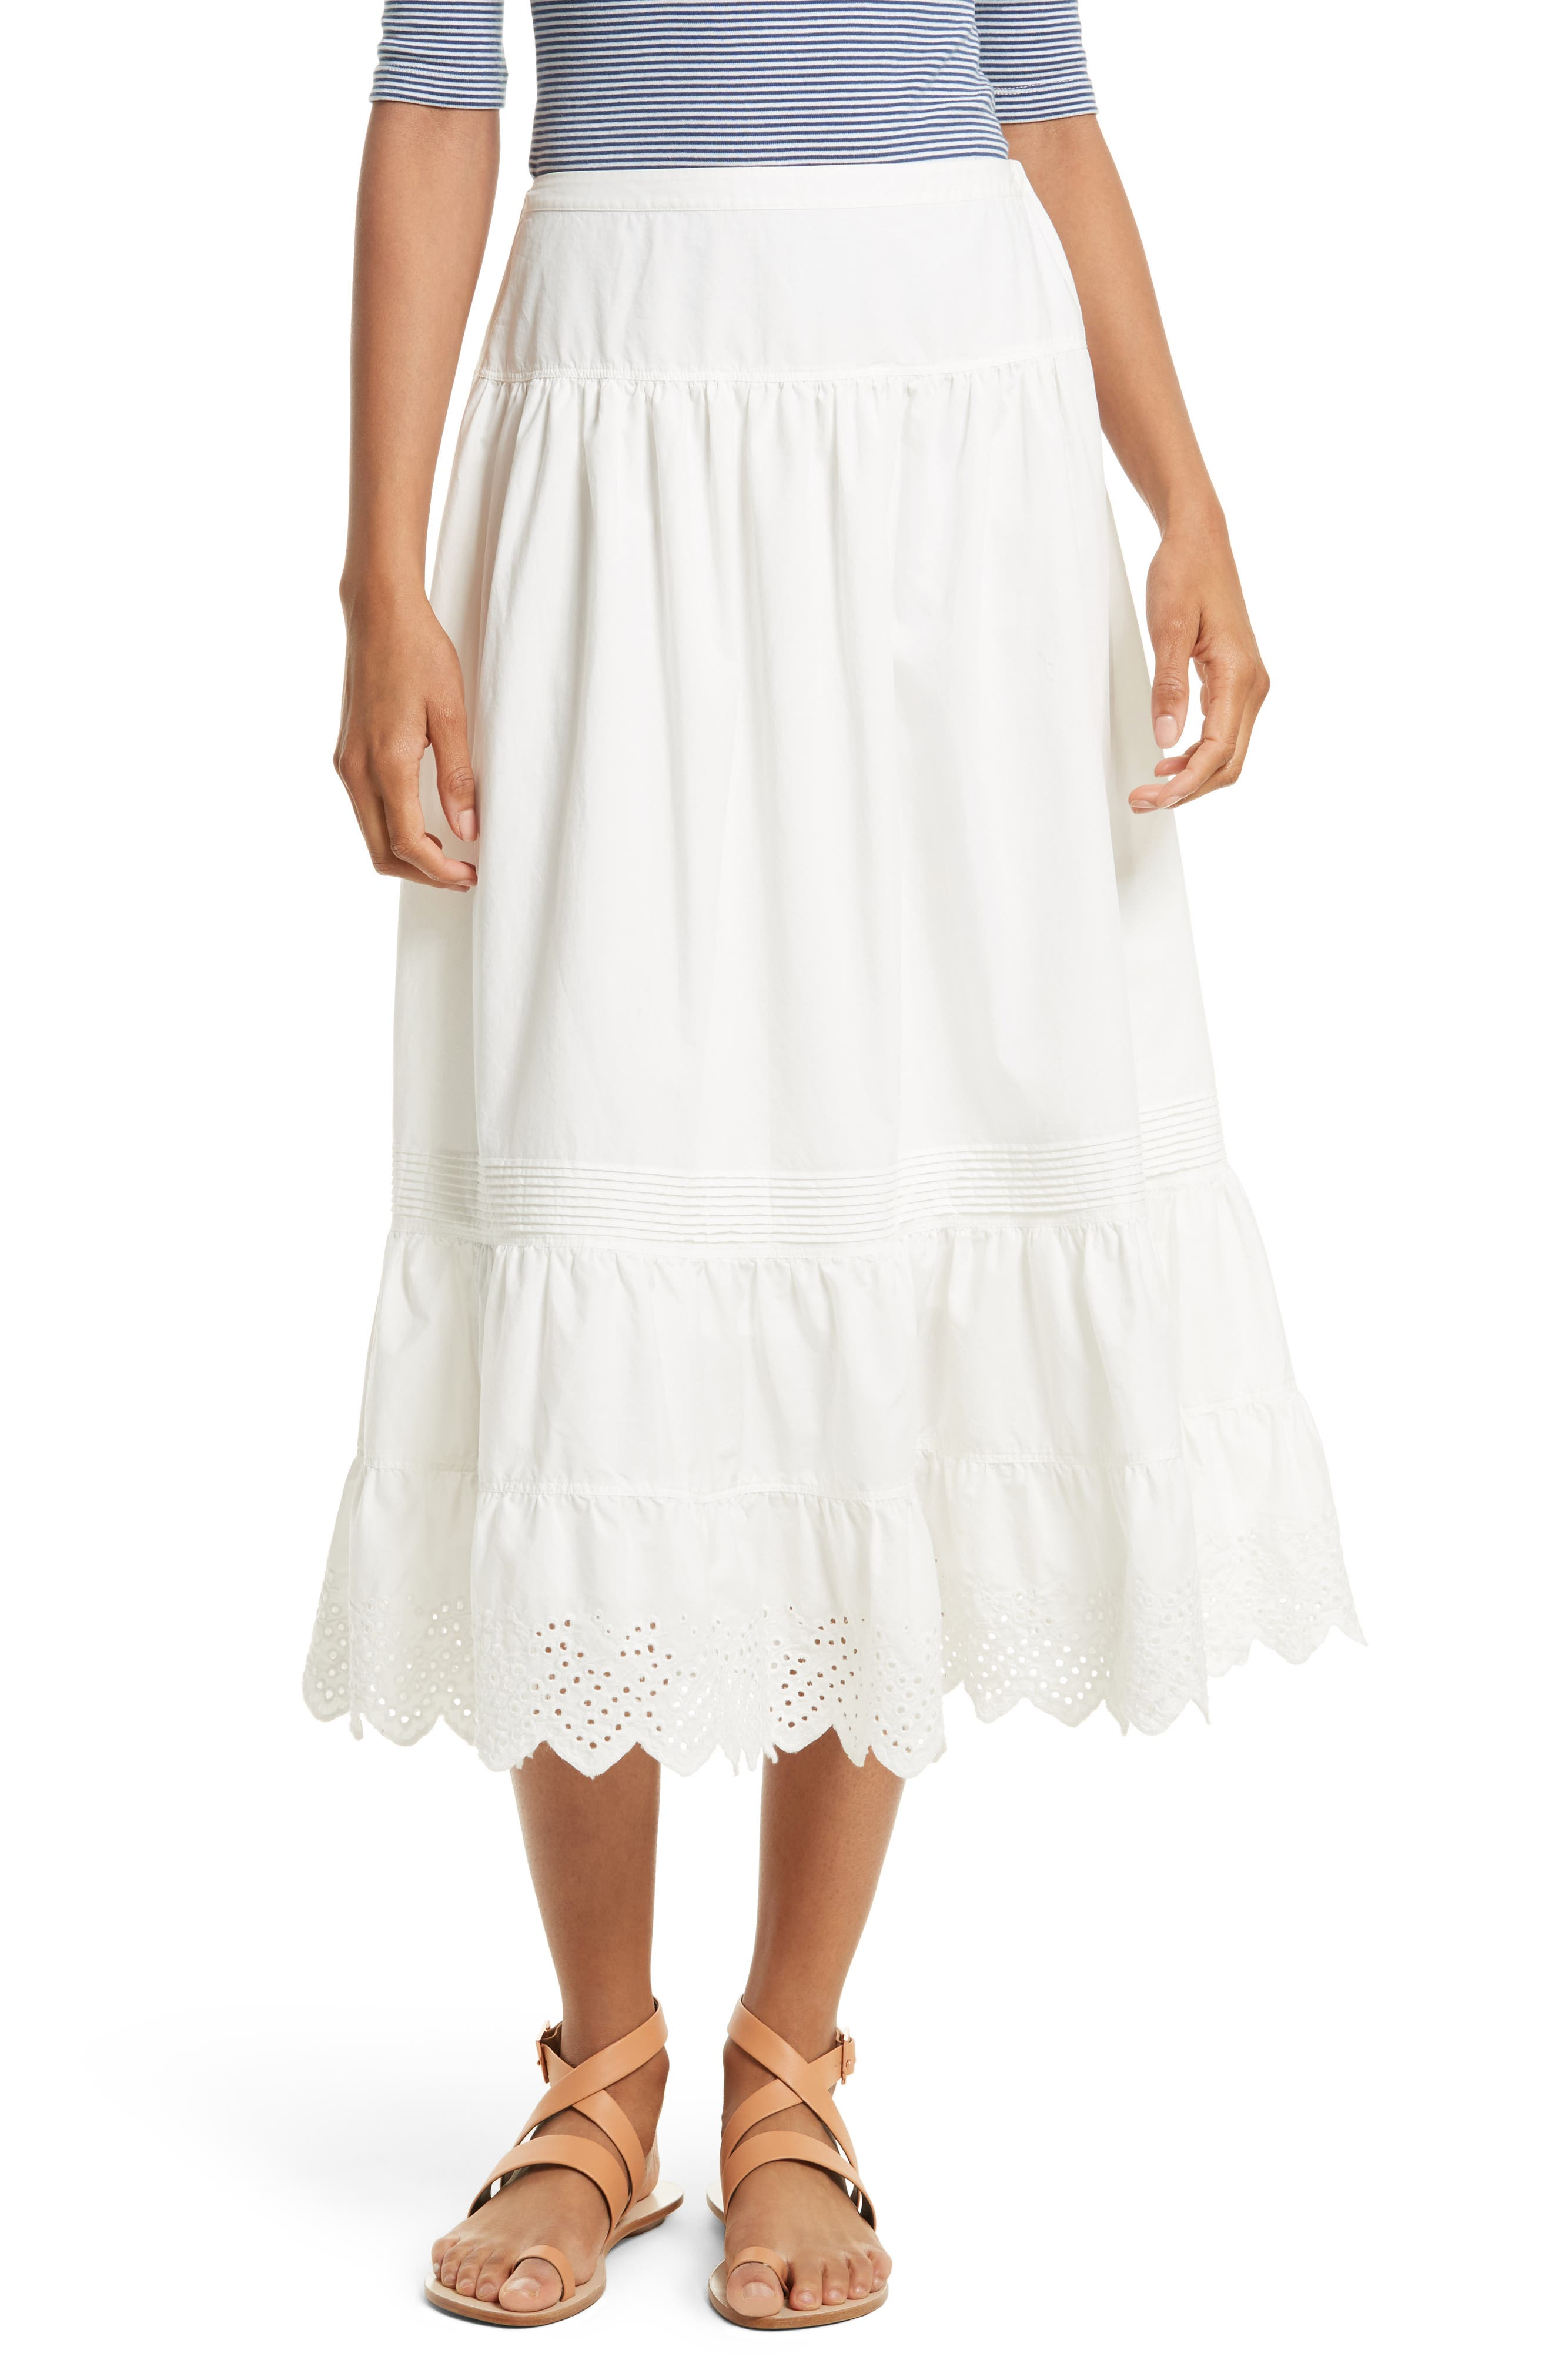 La Vie Rebecca Taylor Eyelet Border Poplin Skirt